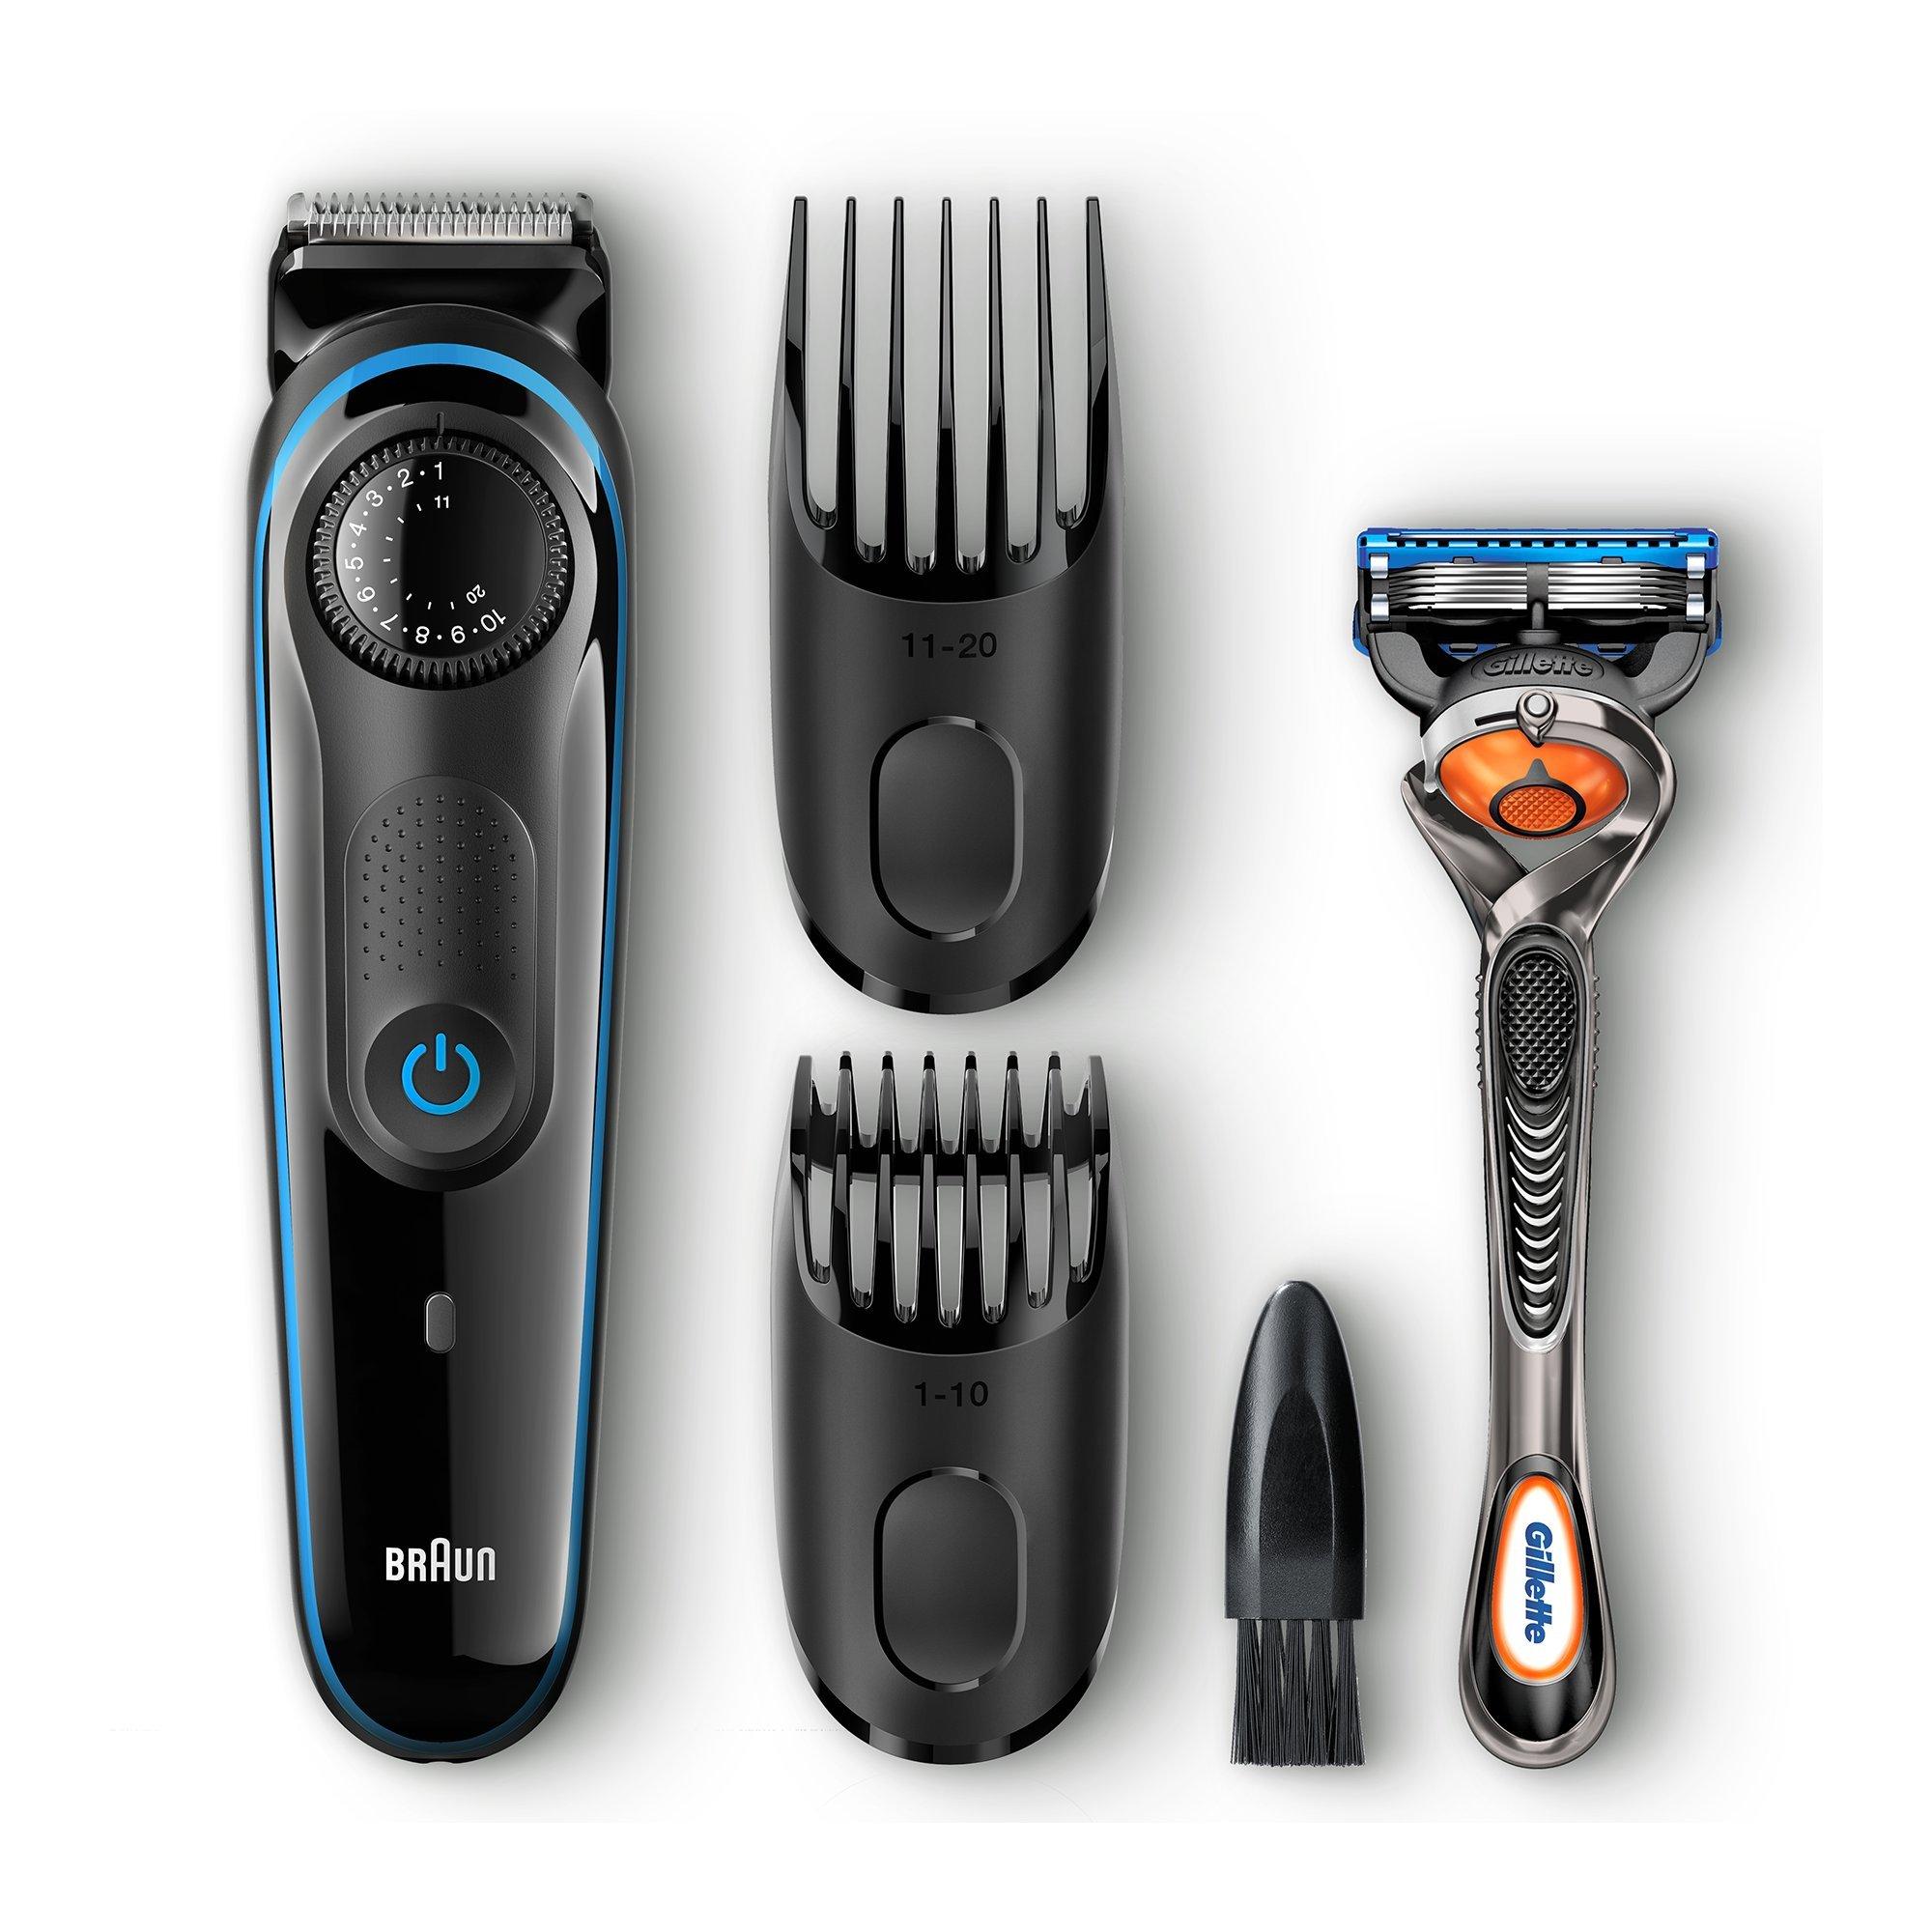 Braun MGK3060 Men's Hair/Beard Trimmer Grooming Kit: $15 @ Amazon